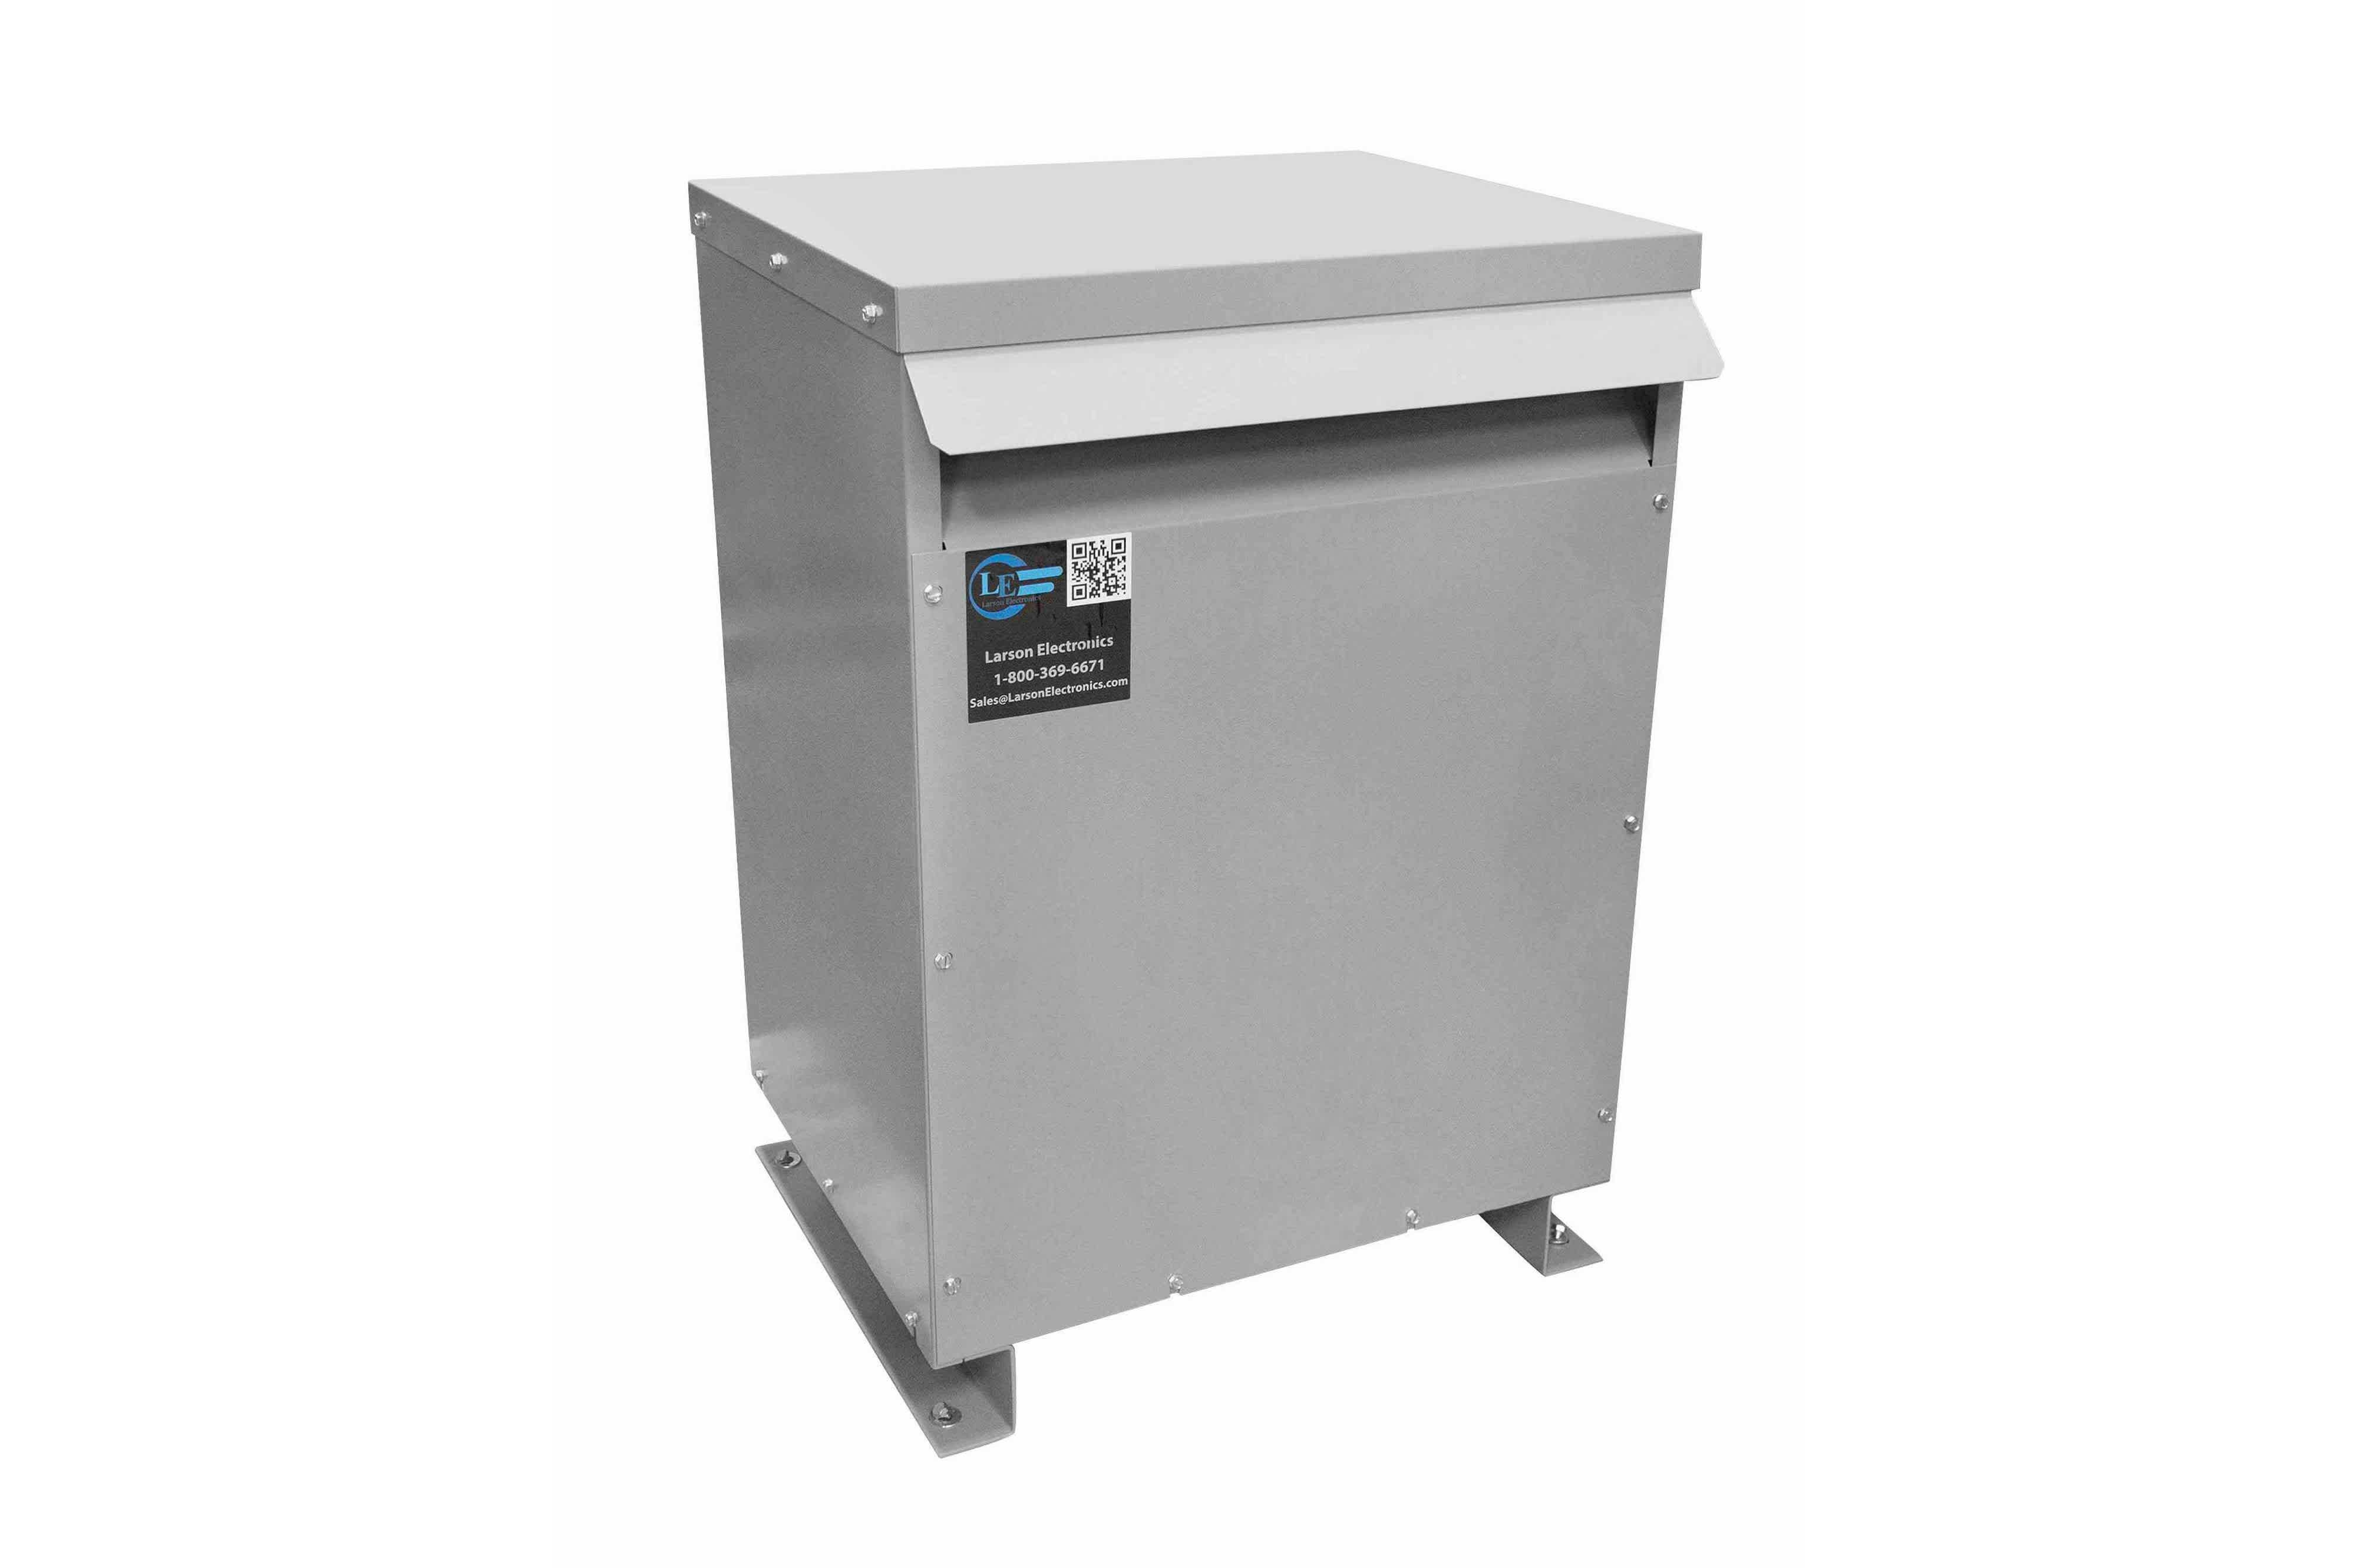 25 kVA 3PH Isolation Transformer, 240V Wye Primary, 208V Delta Secondary, N3R, Ventilated, 60 Hz